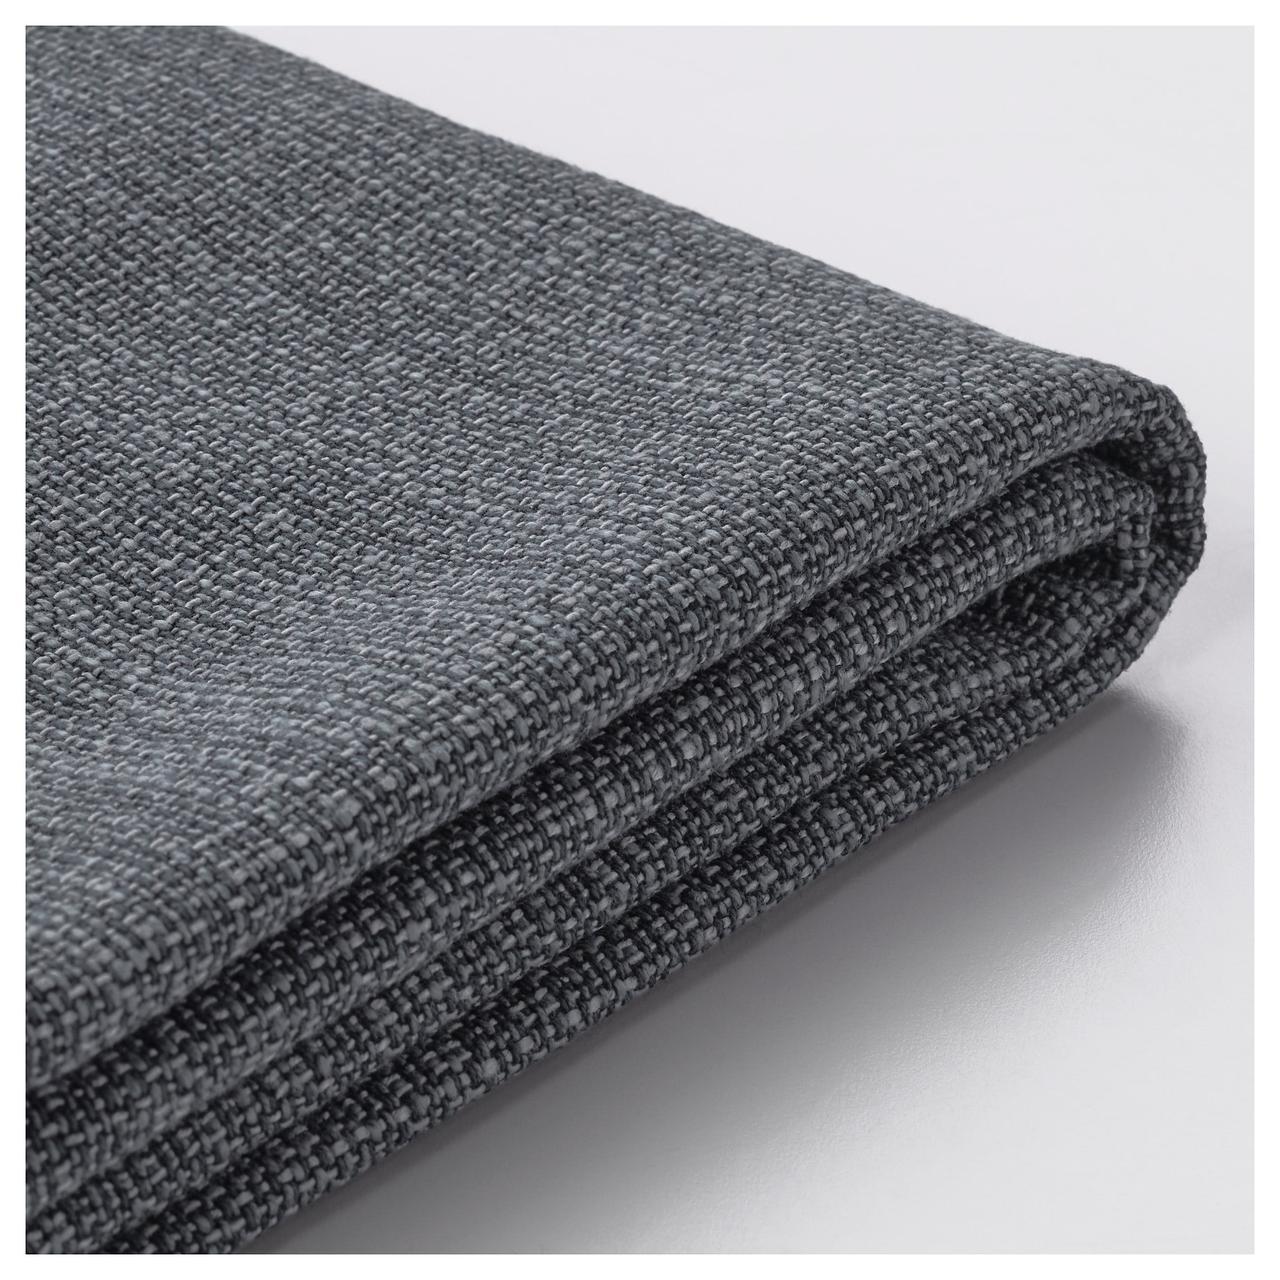 ВАЛЛЕНТУНА Чехол секции дивана-кровати, Хилларед темно-серый